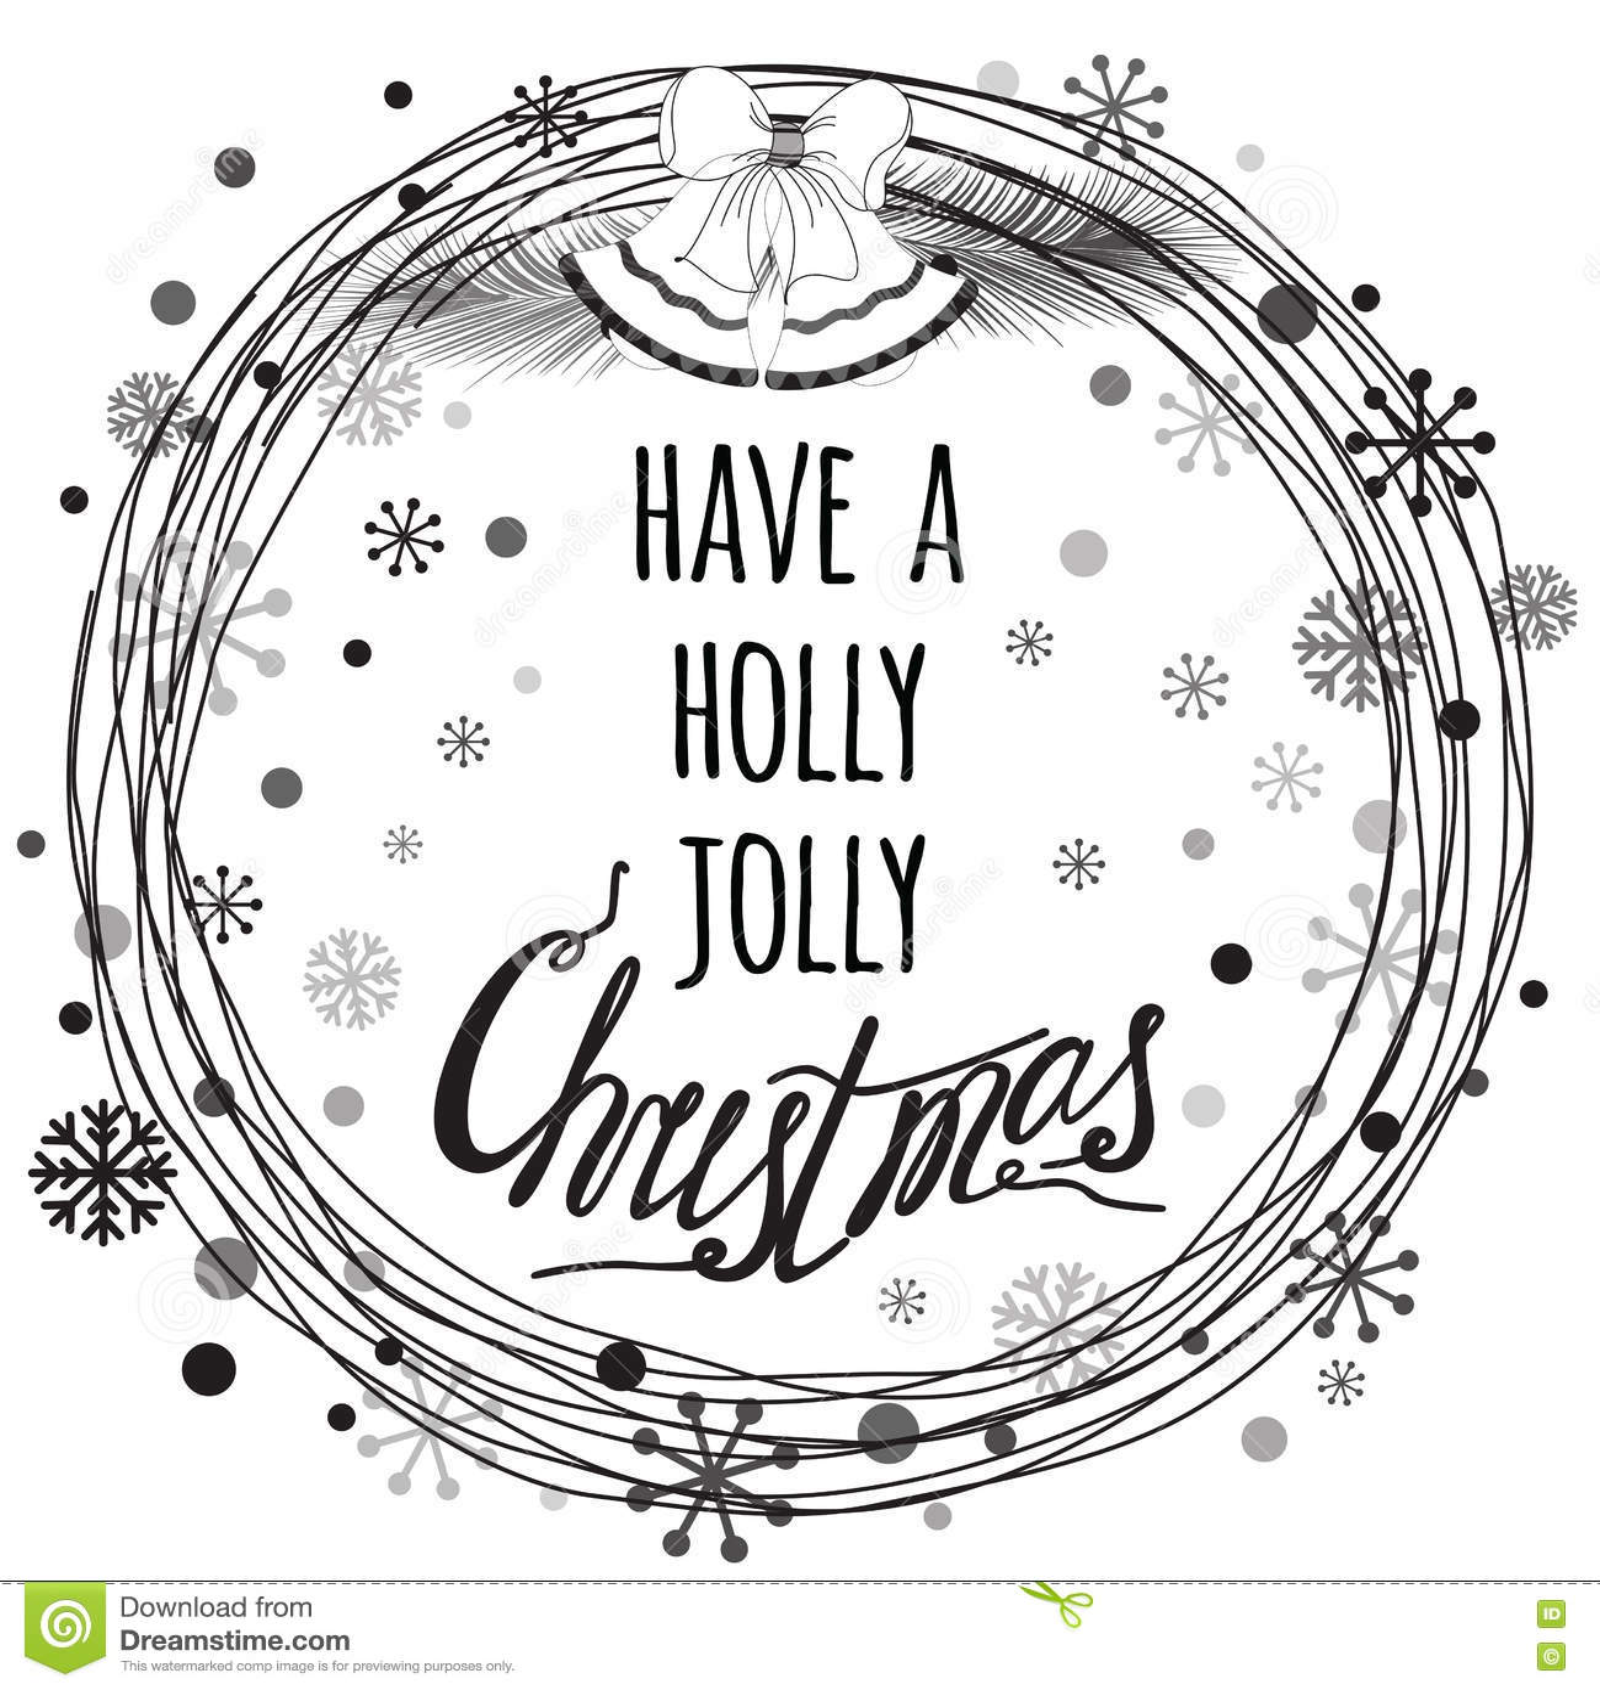 Heb Een Holly Jolly Christmas Quote Typography Banner-Ontwerp Vector ...